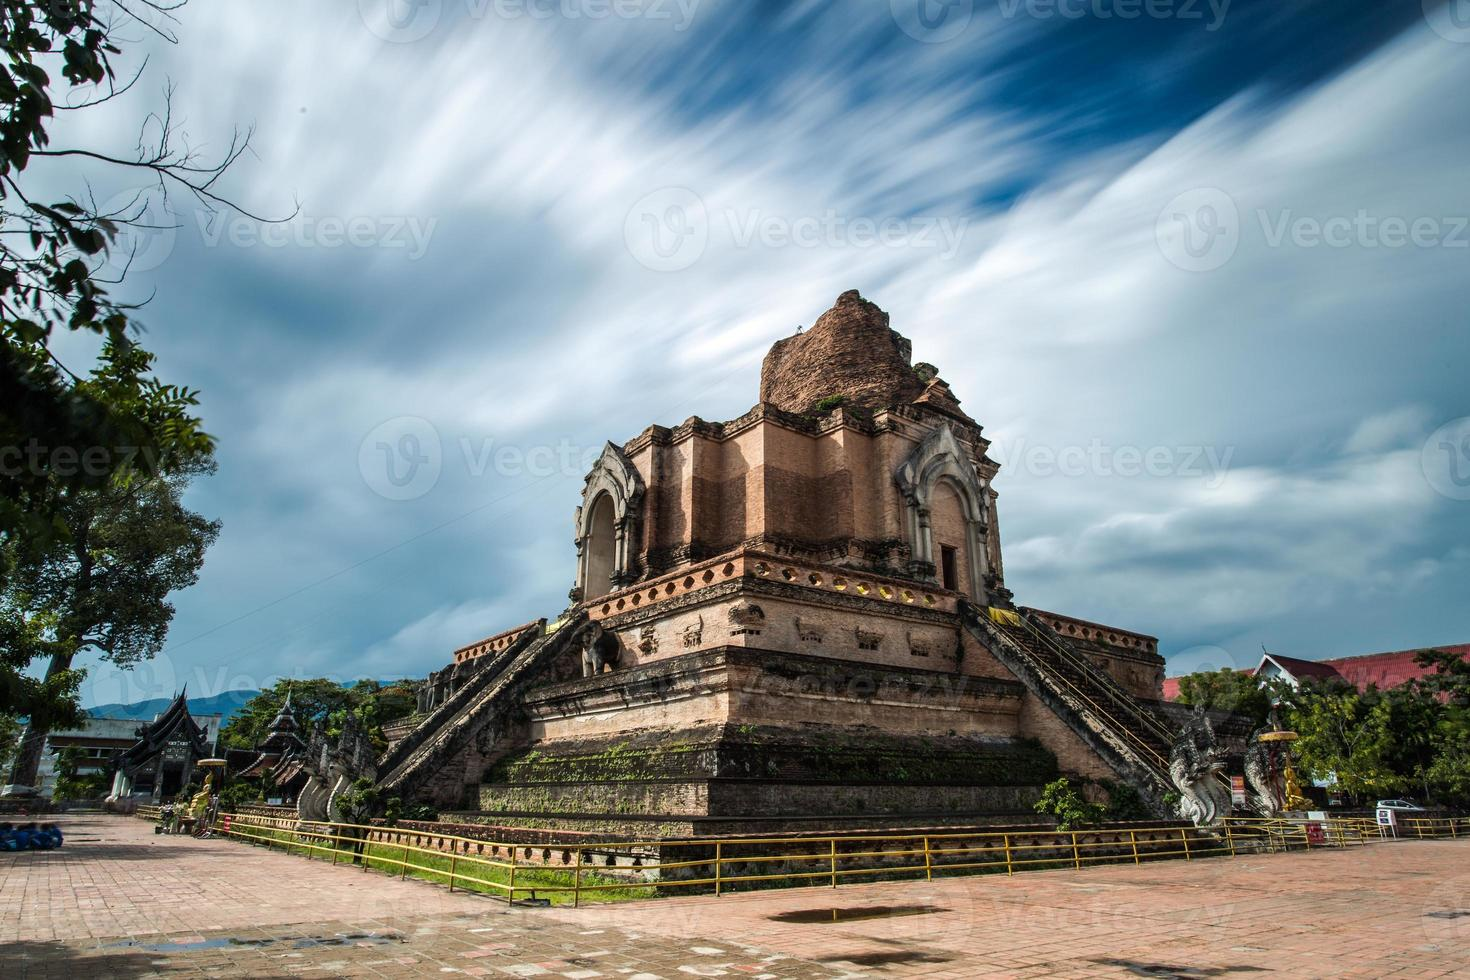 buddhistischer tempel in chiang mai, thailand foto